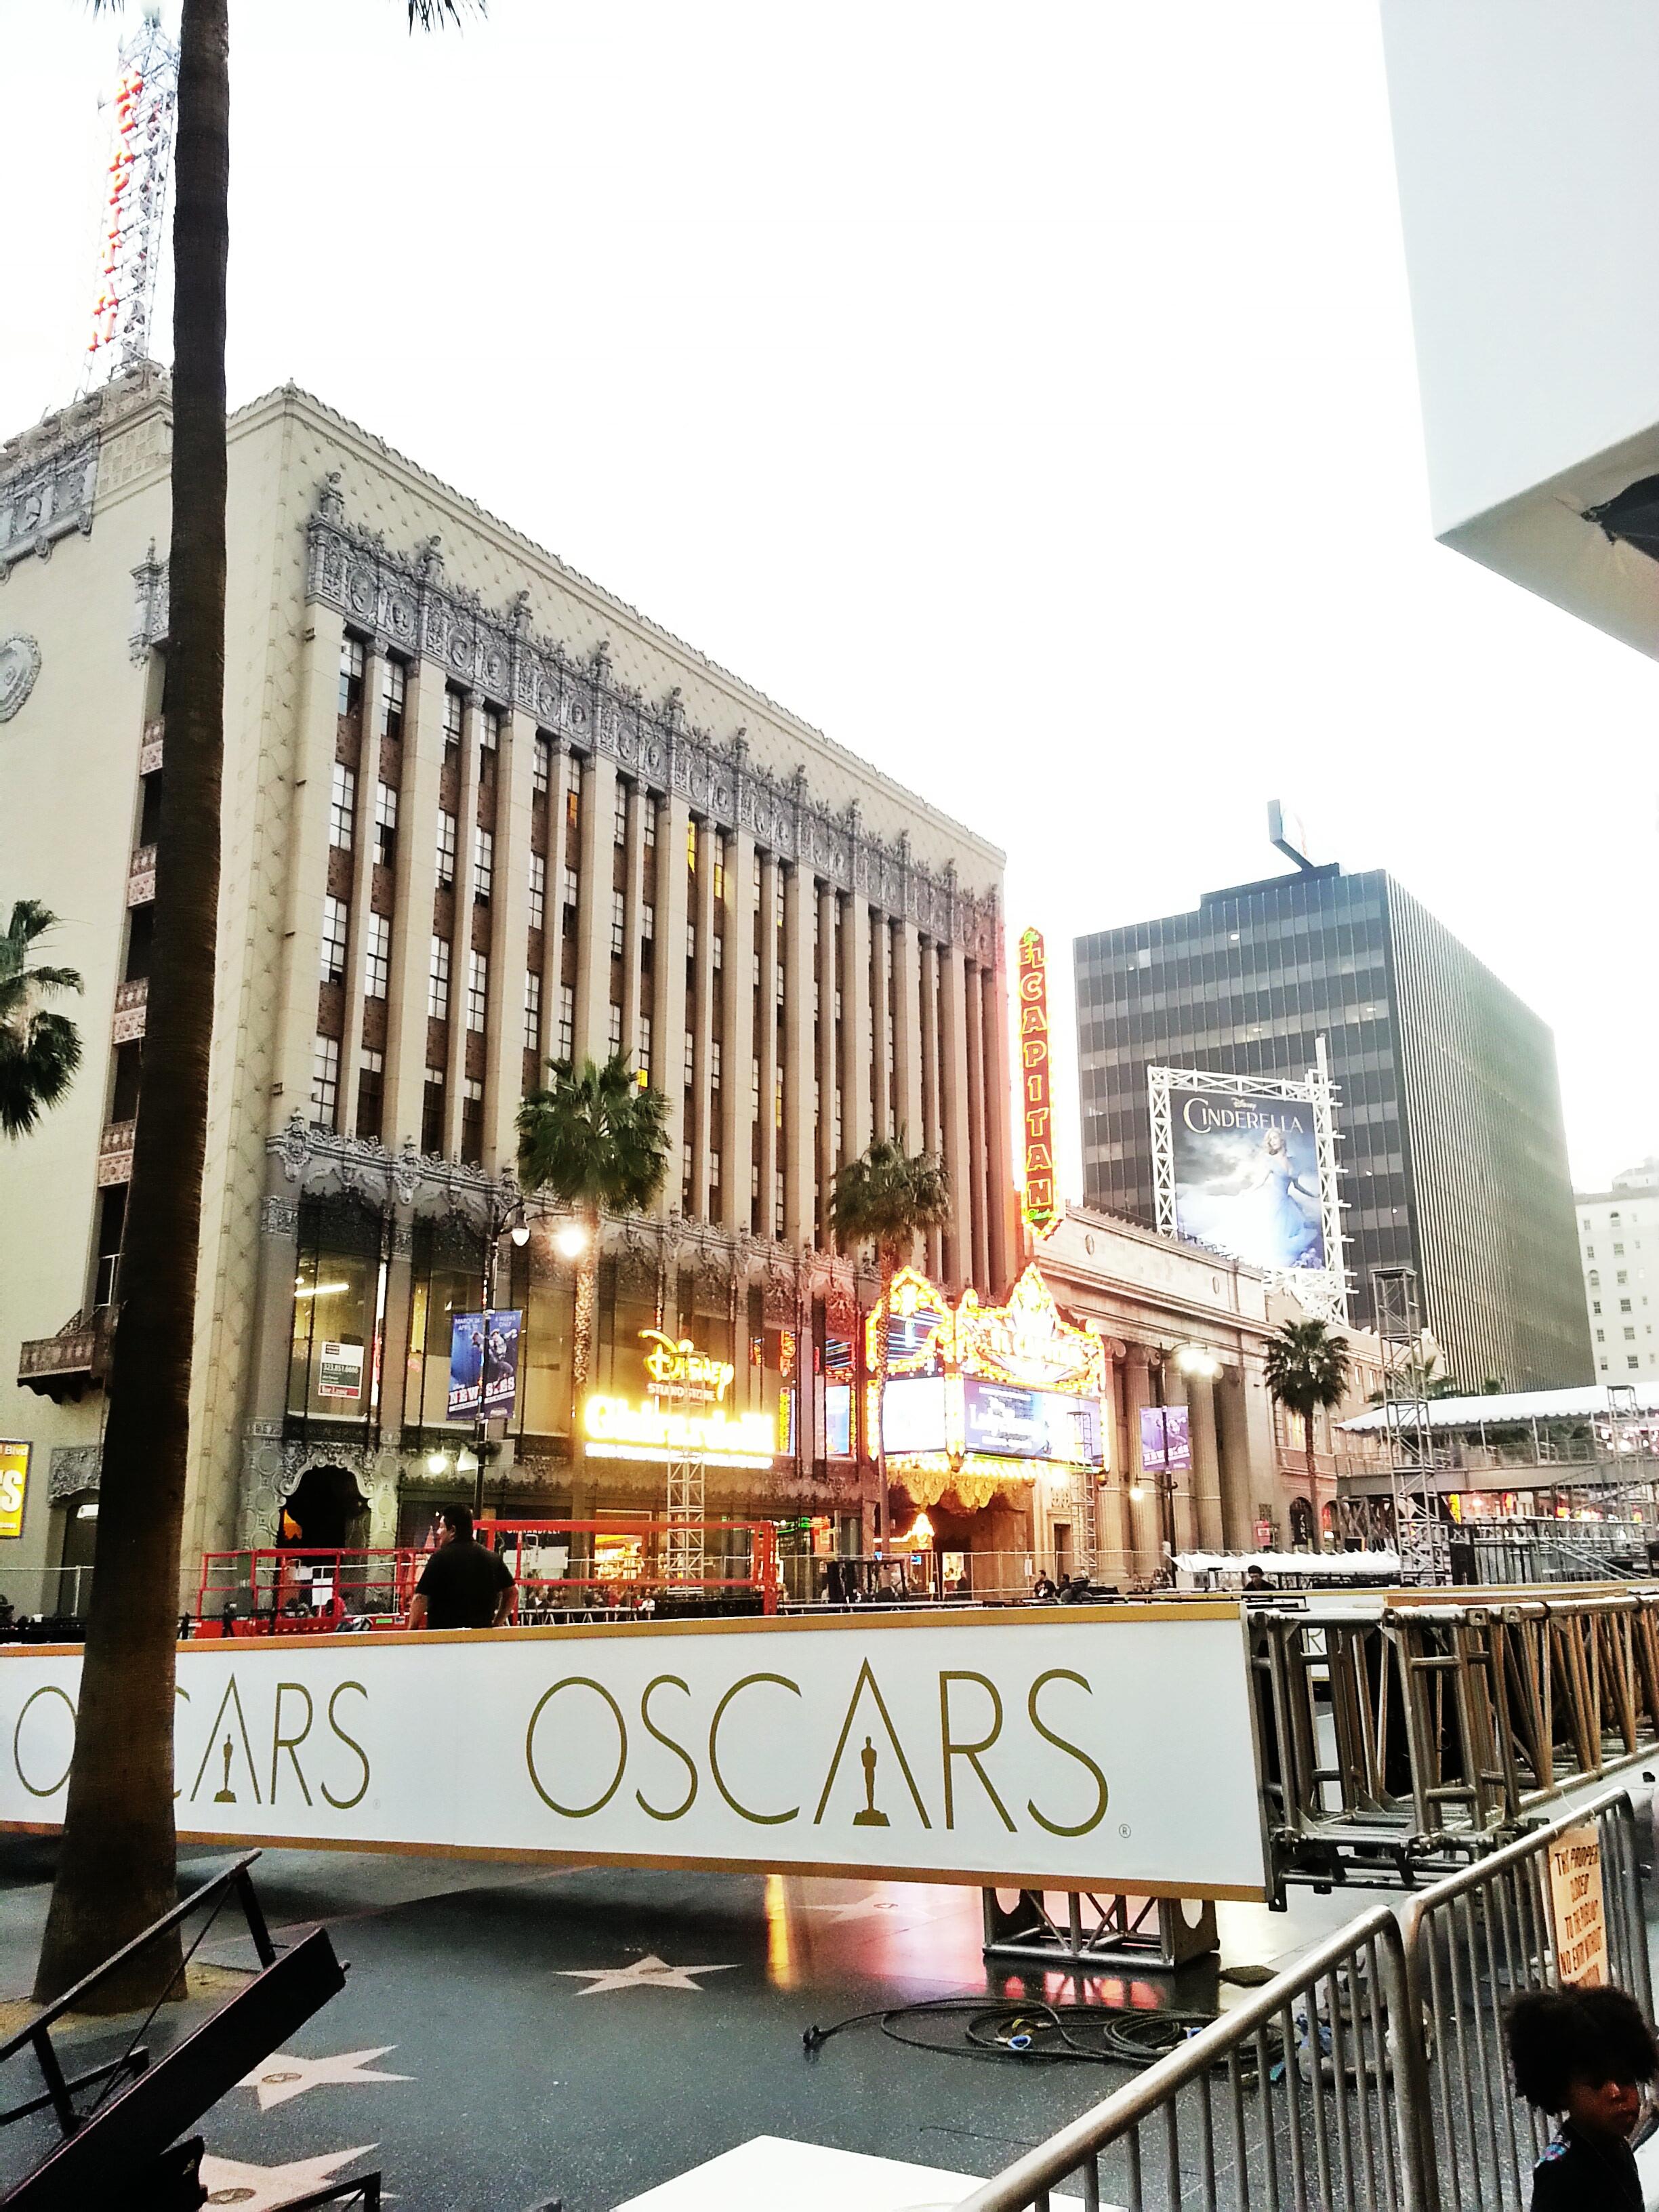 Hollywood Blvd preparing for the Oscars